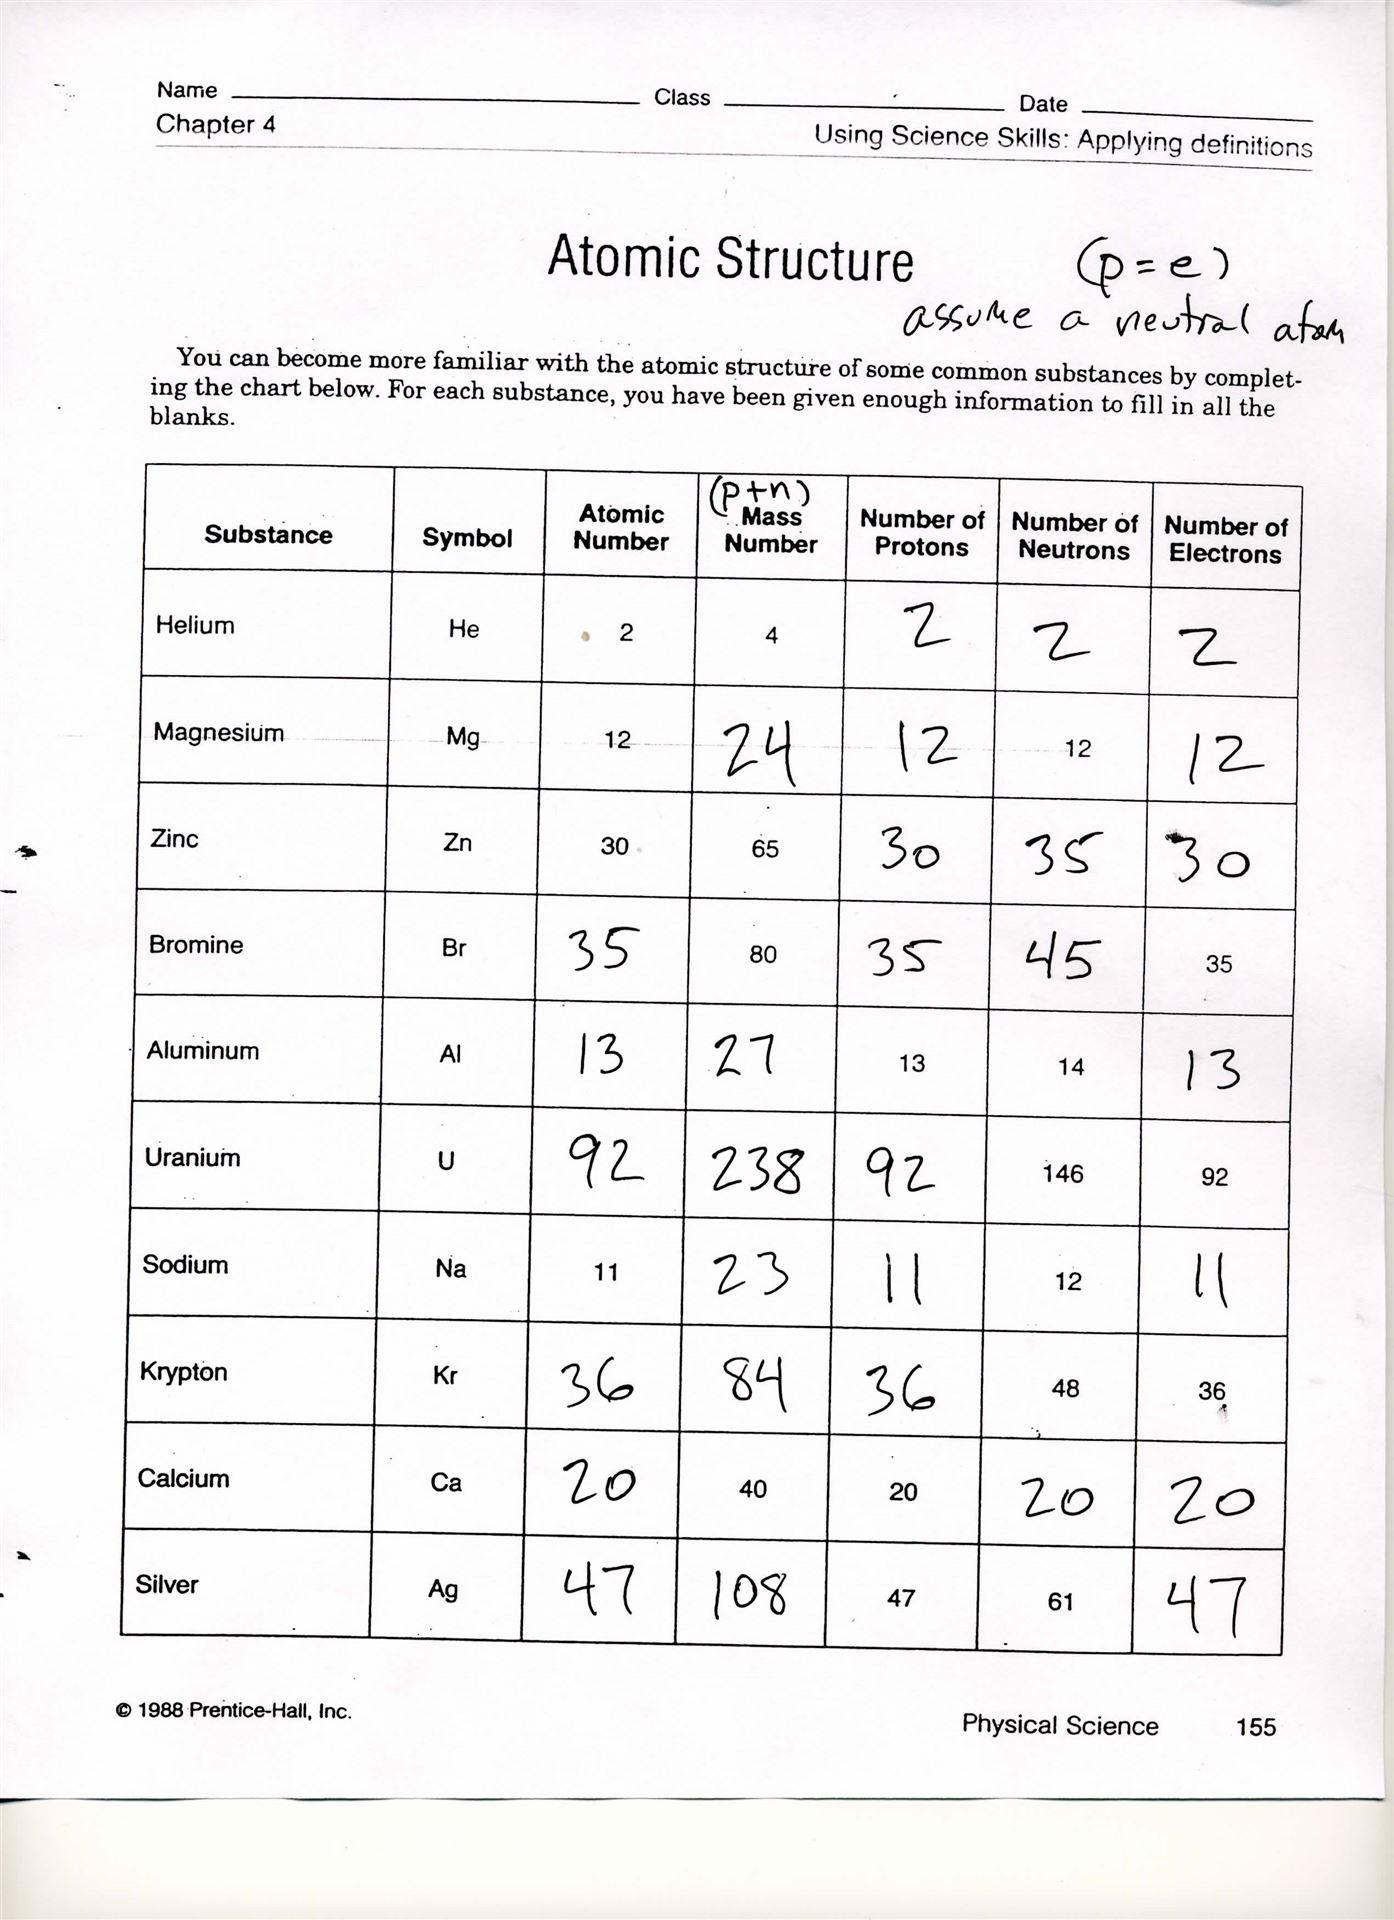 Basic atomic Structure Worksheet Answers 34 atomic Structure Worksheet Answers Chemistry Worksheet